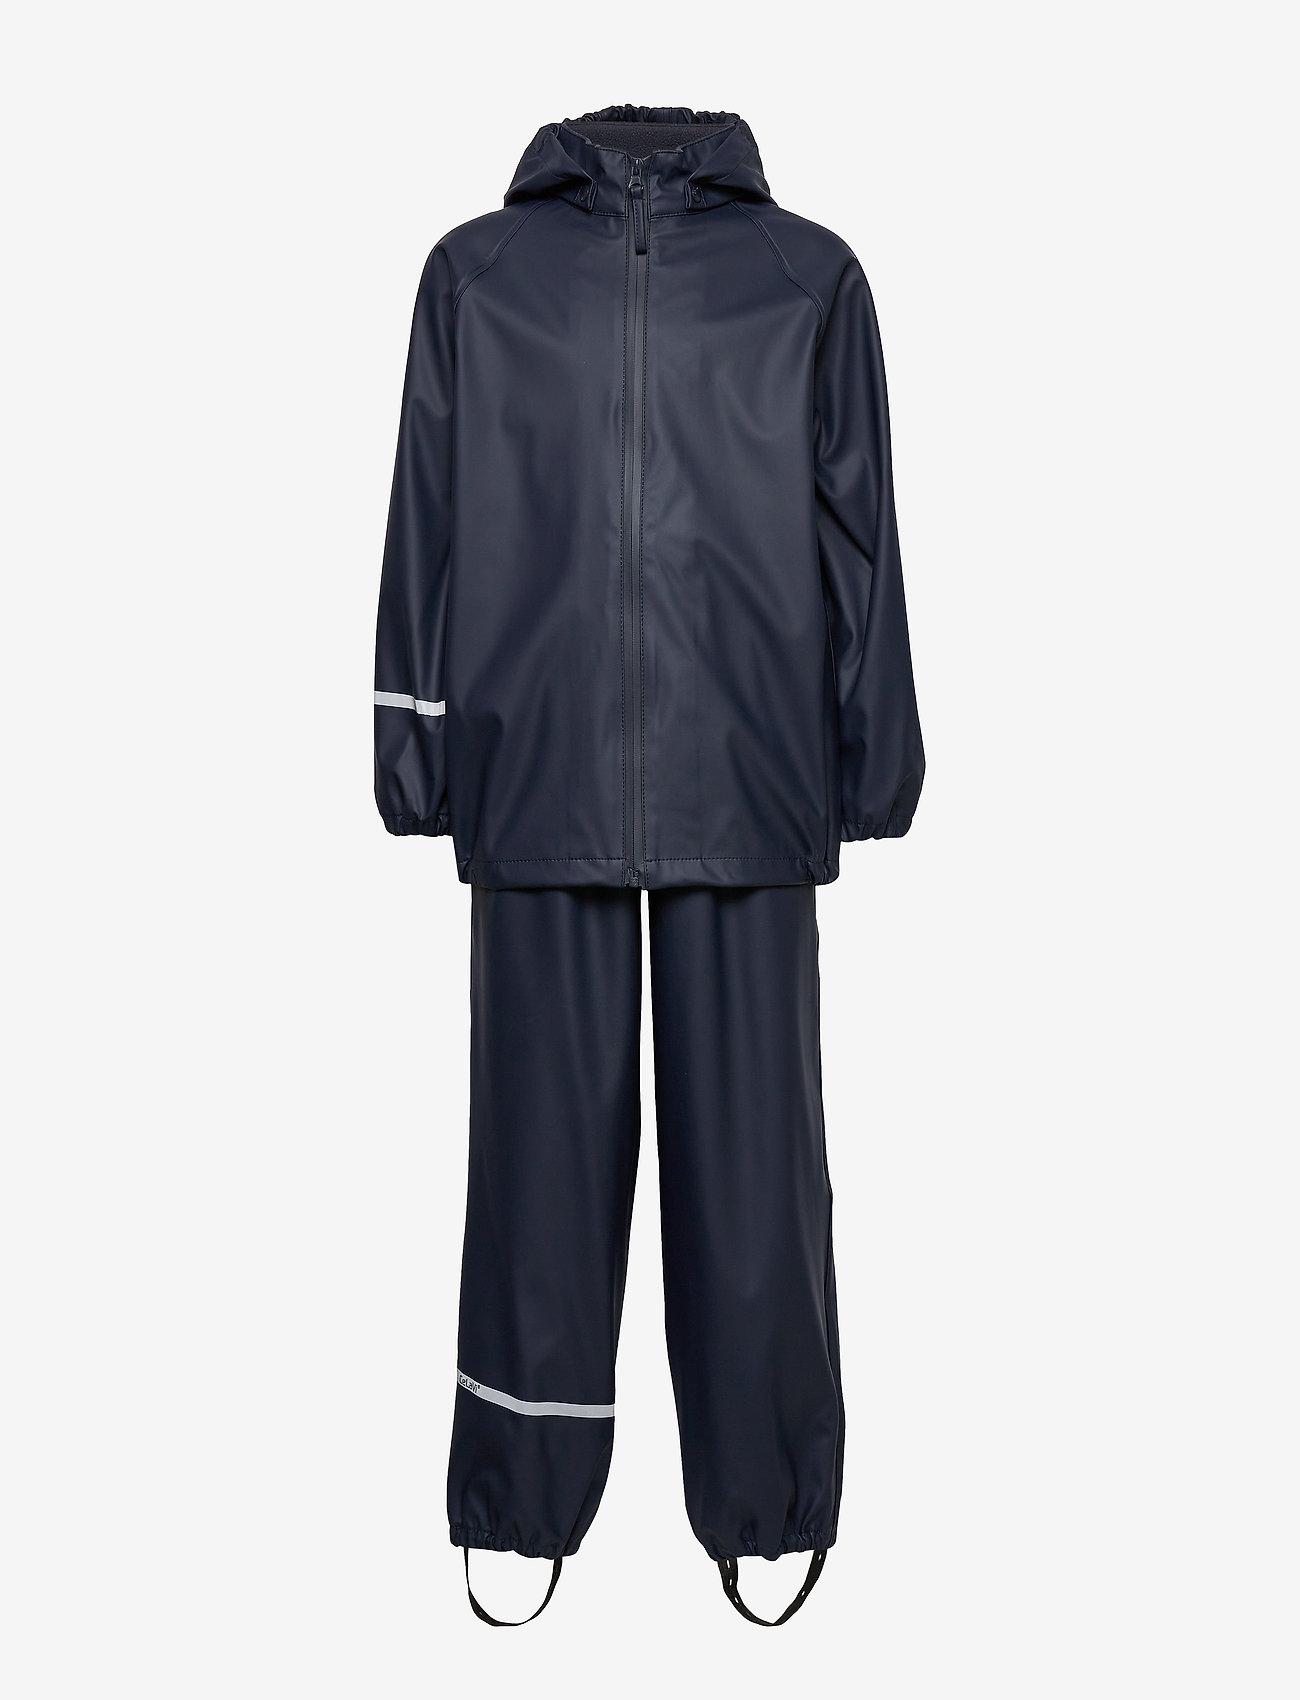 CeLaVi - Basic rainwear set -Recycle PU - sets & suits - dark navy - 0